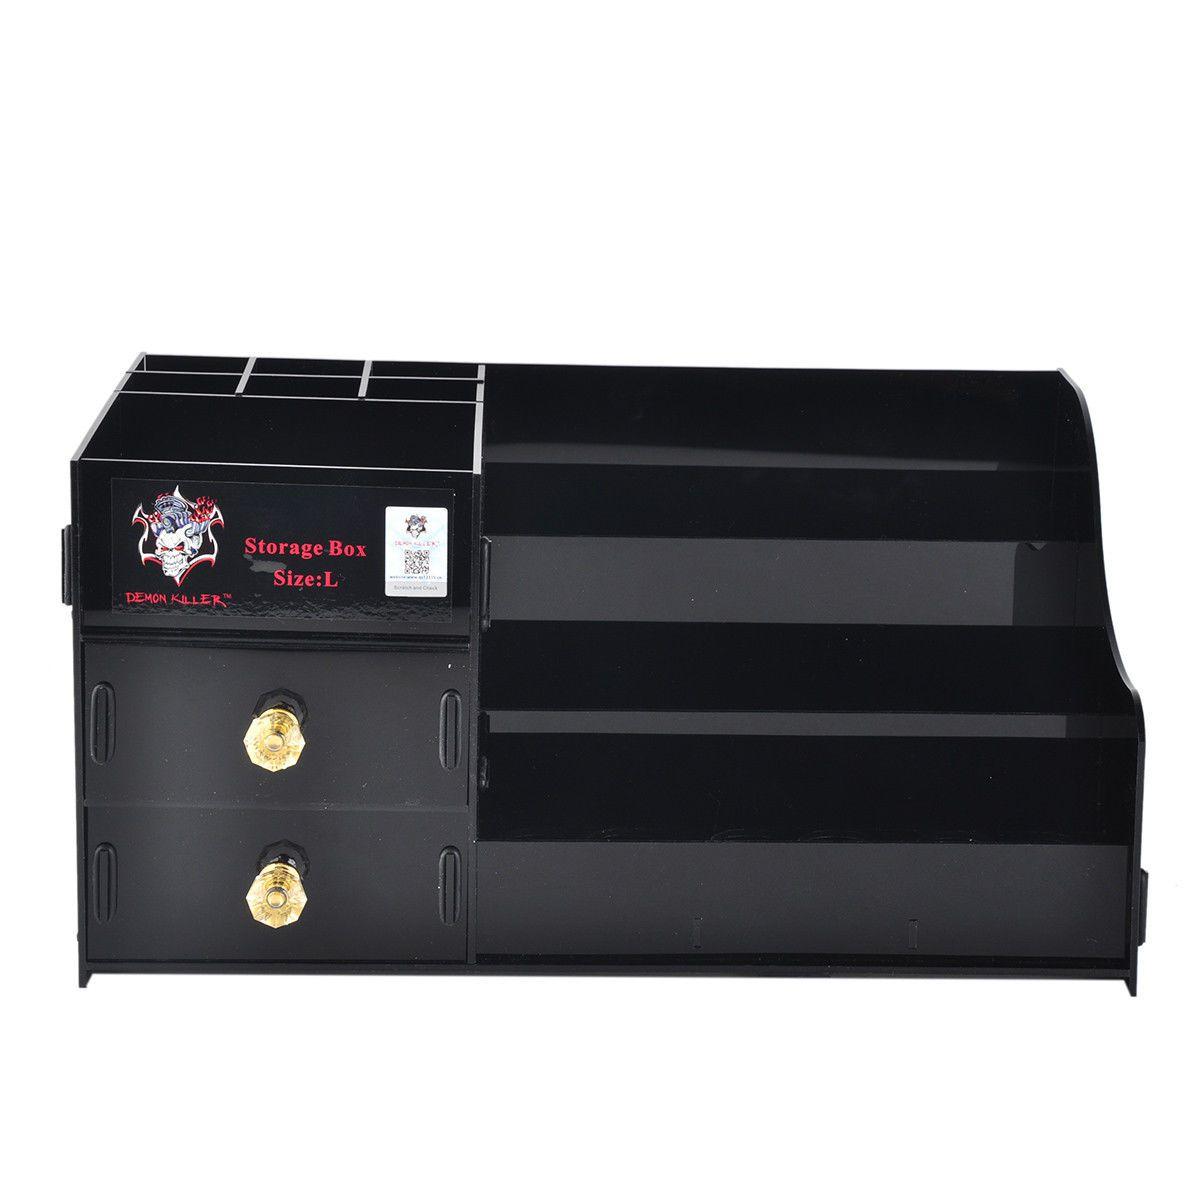 Demon Killer - Storage Box Médio